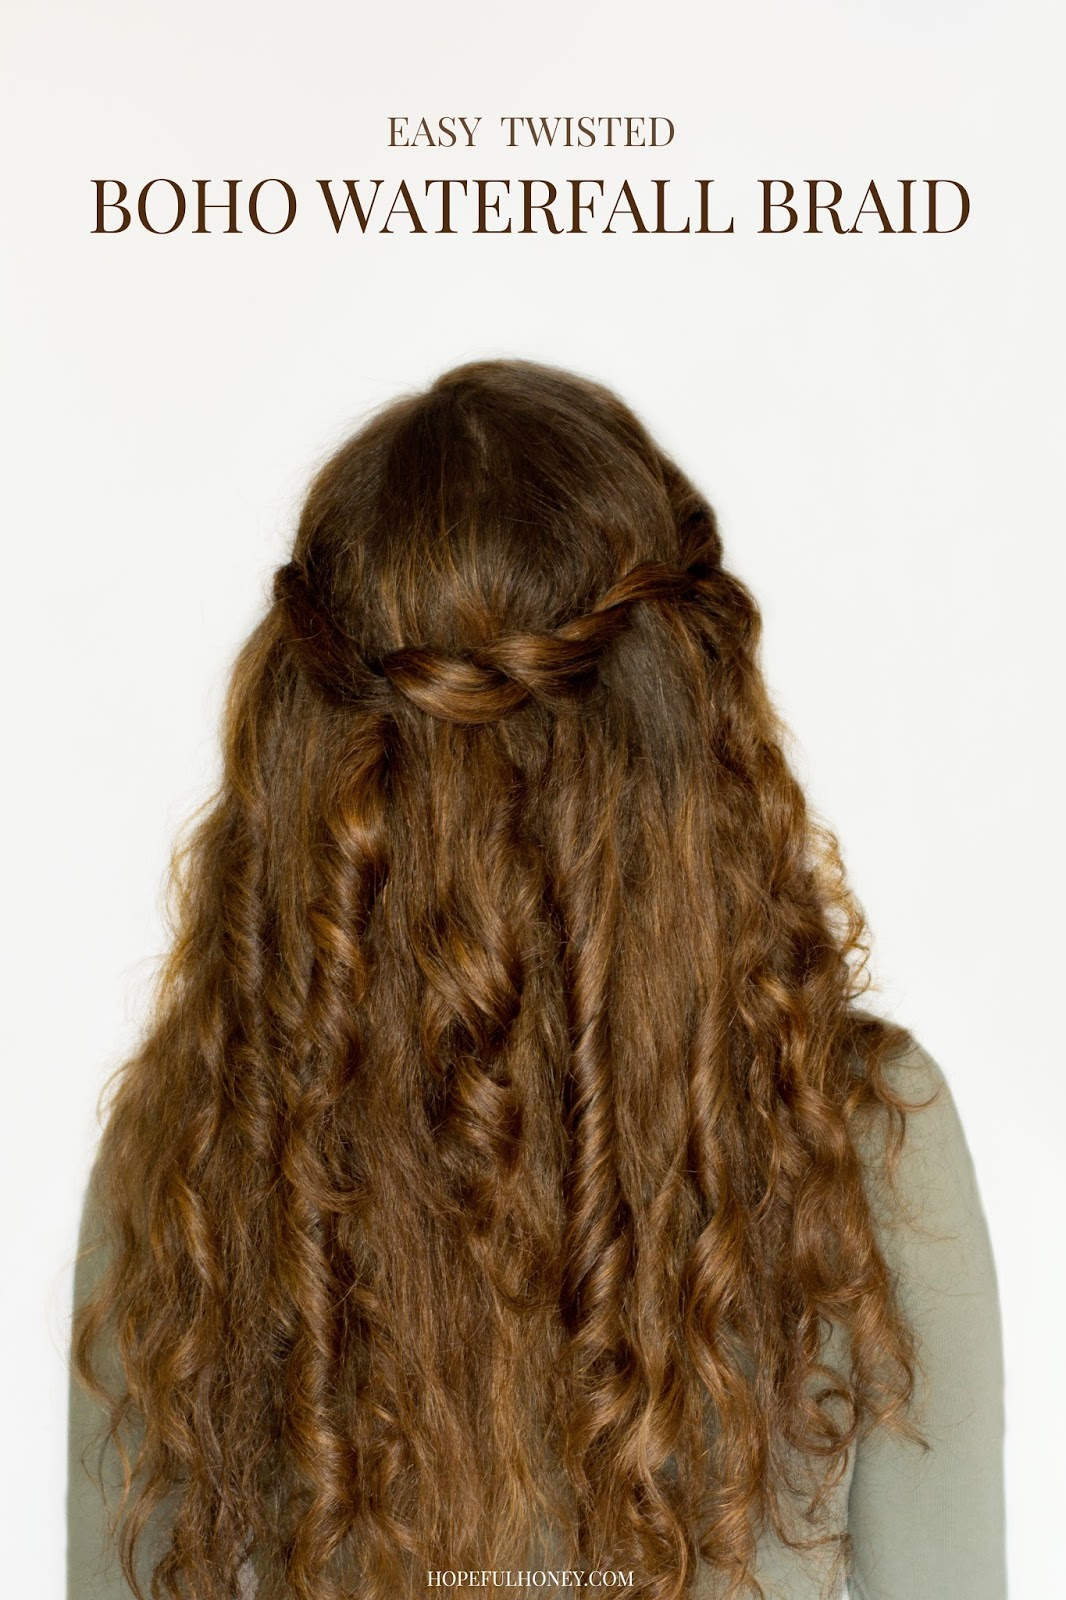 http://2.bp.blogspot.com/-U-ZVKQLXOug/U6jPfEi5wKI/AAAAAAAALKw/oiKqAia-rk8/s1600/Easy+Twisted+Waterfall+Braid+-+Bohemian+Hair+Tutorial+7.jpg